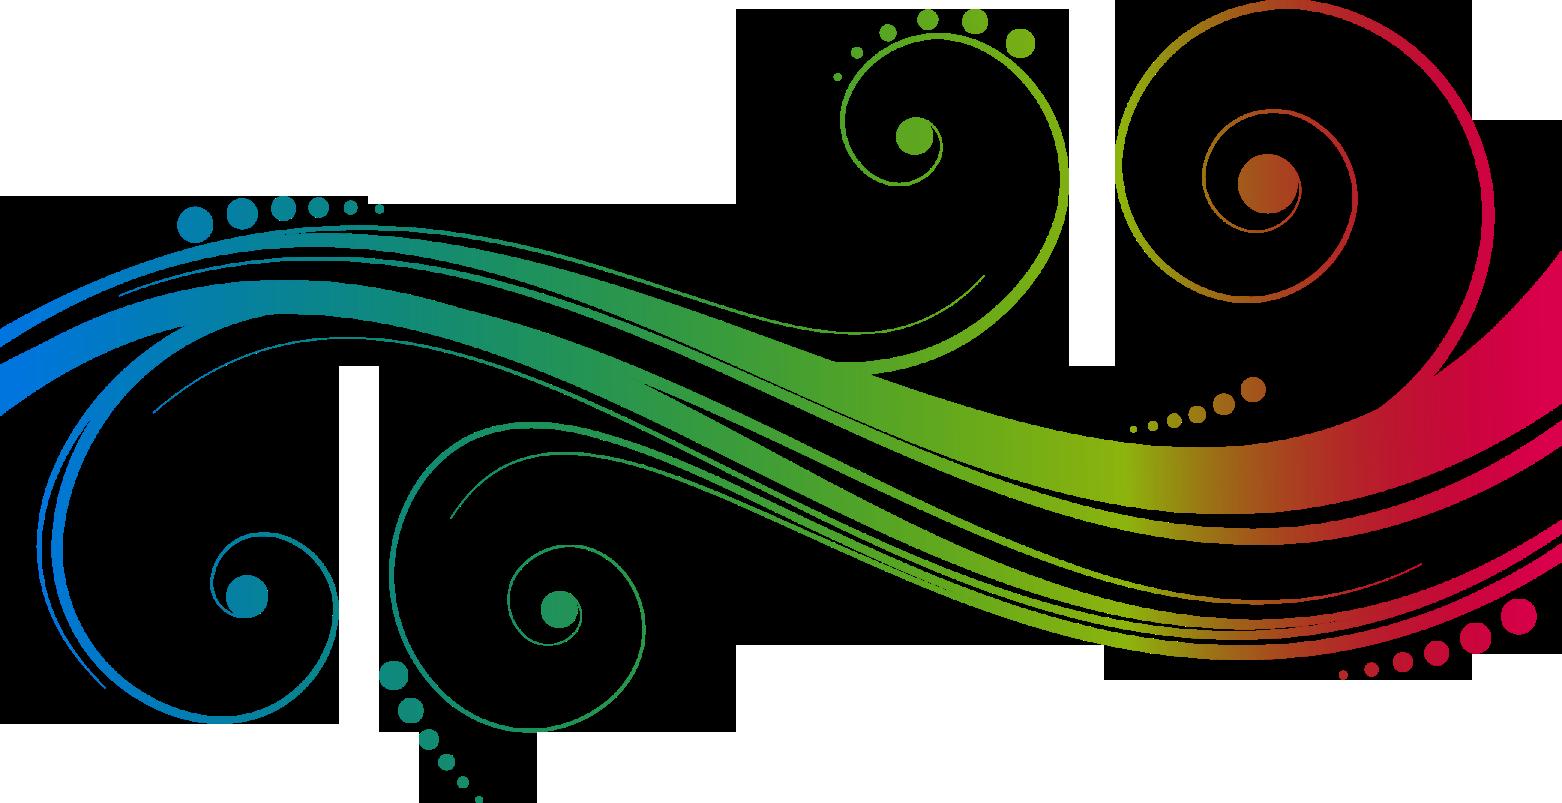 1562x803 15 Vector Swirls Png For Free Download On Mbtskoudsalg